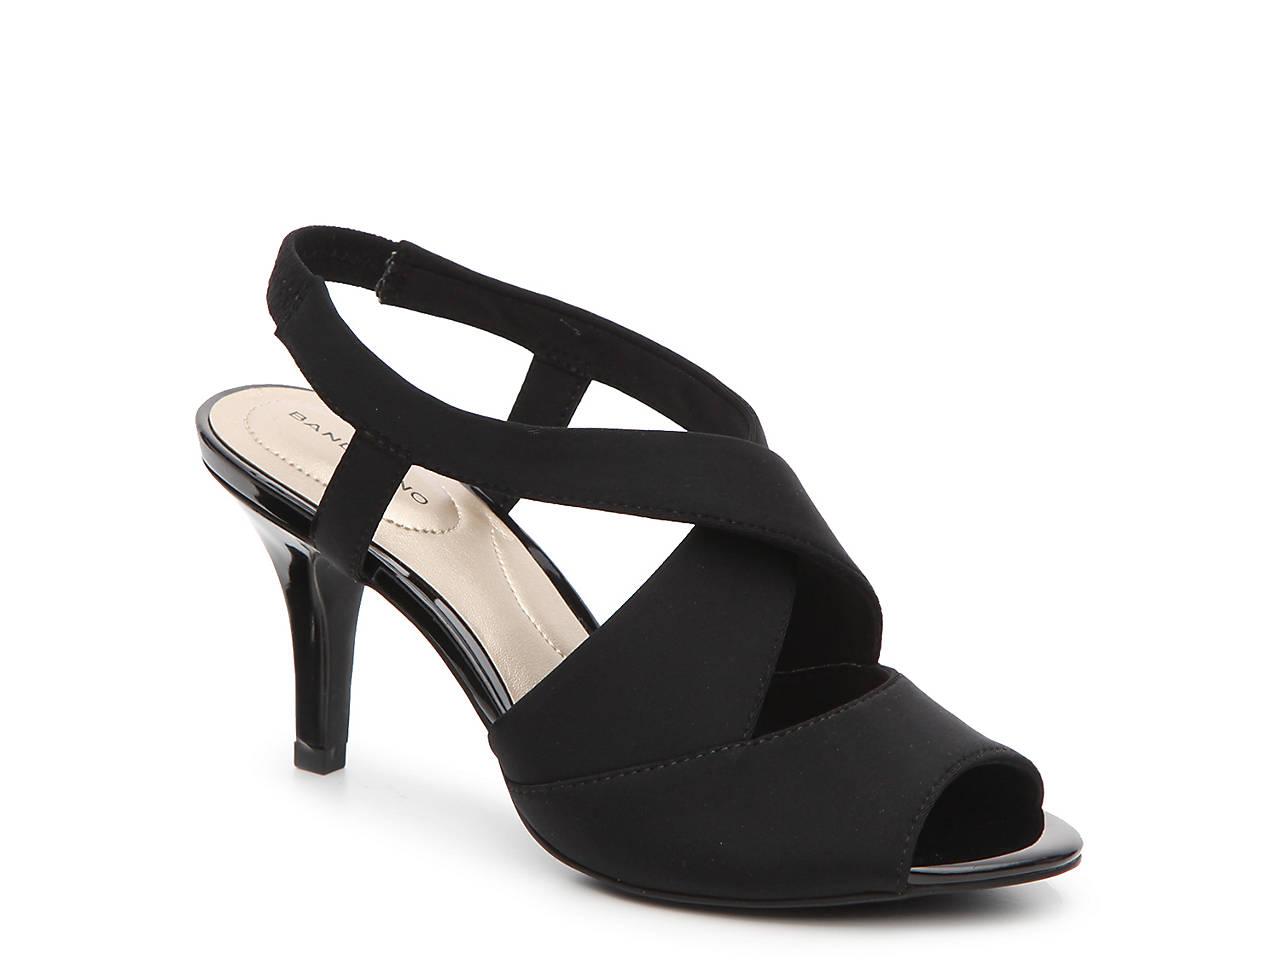 5ff75558fb3 Bandolino Malorie Wishbone Sandal Women s Shoes